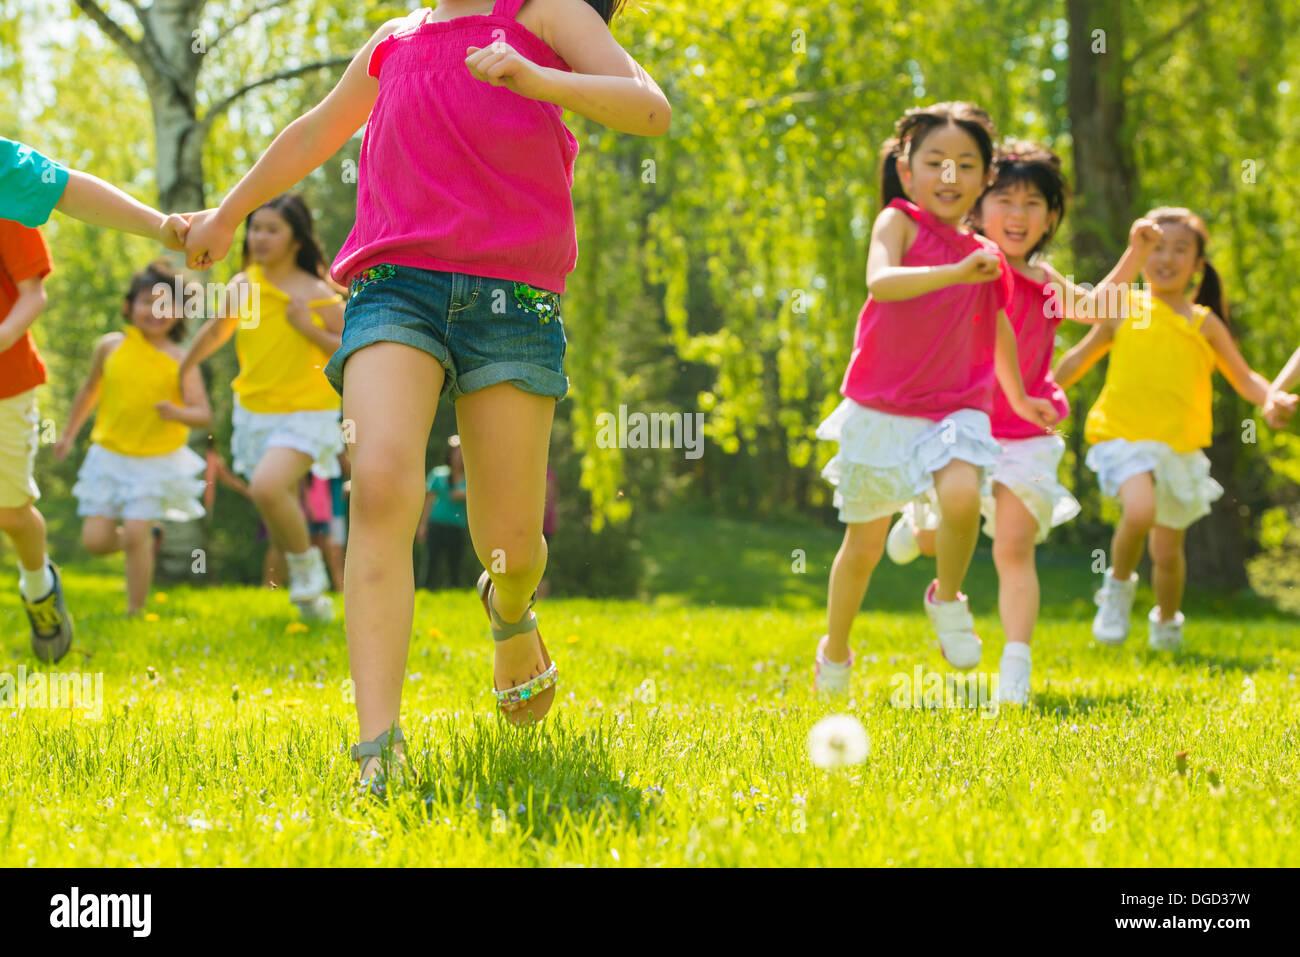 Children running on grass Photo Stock